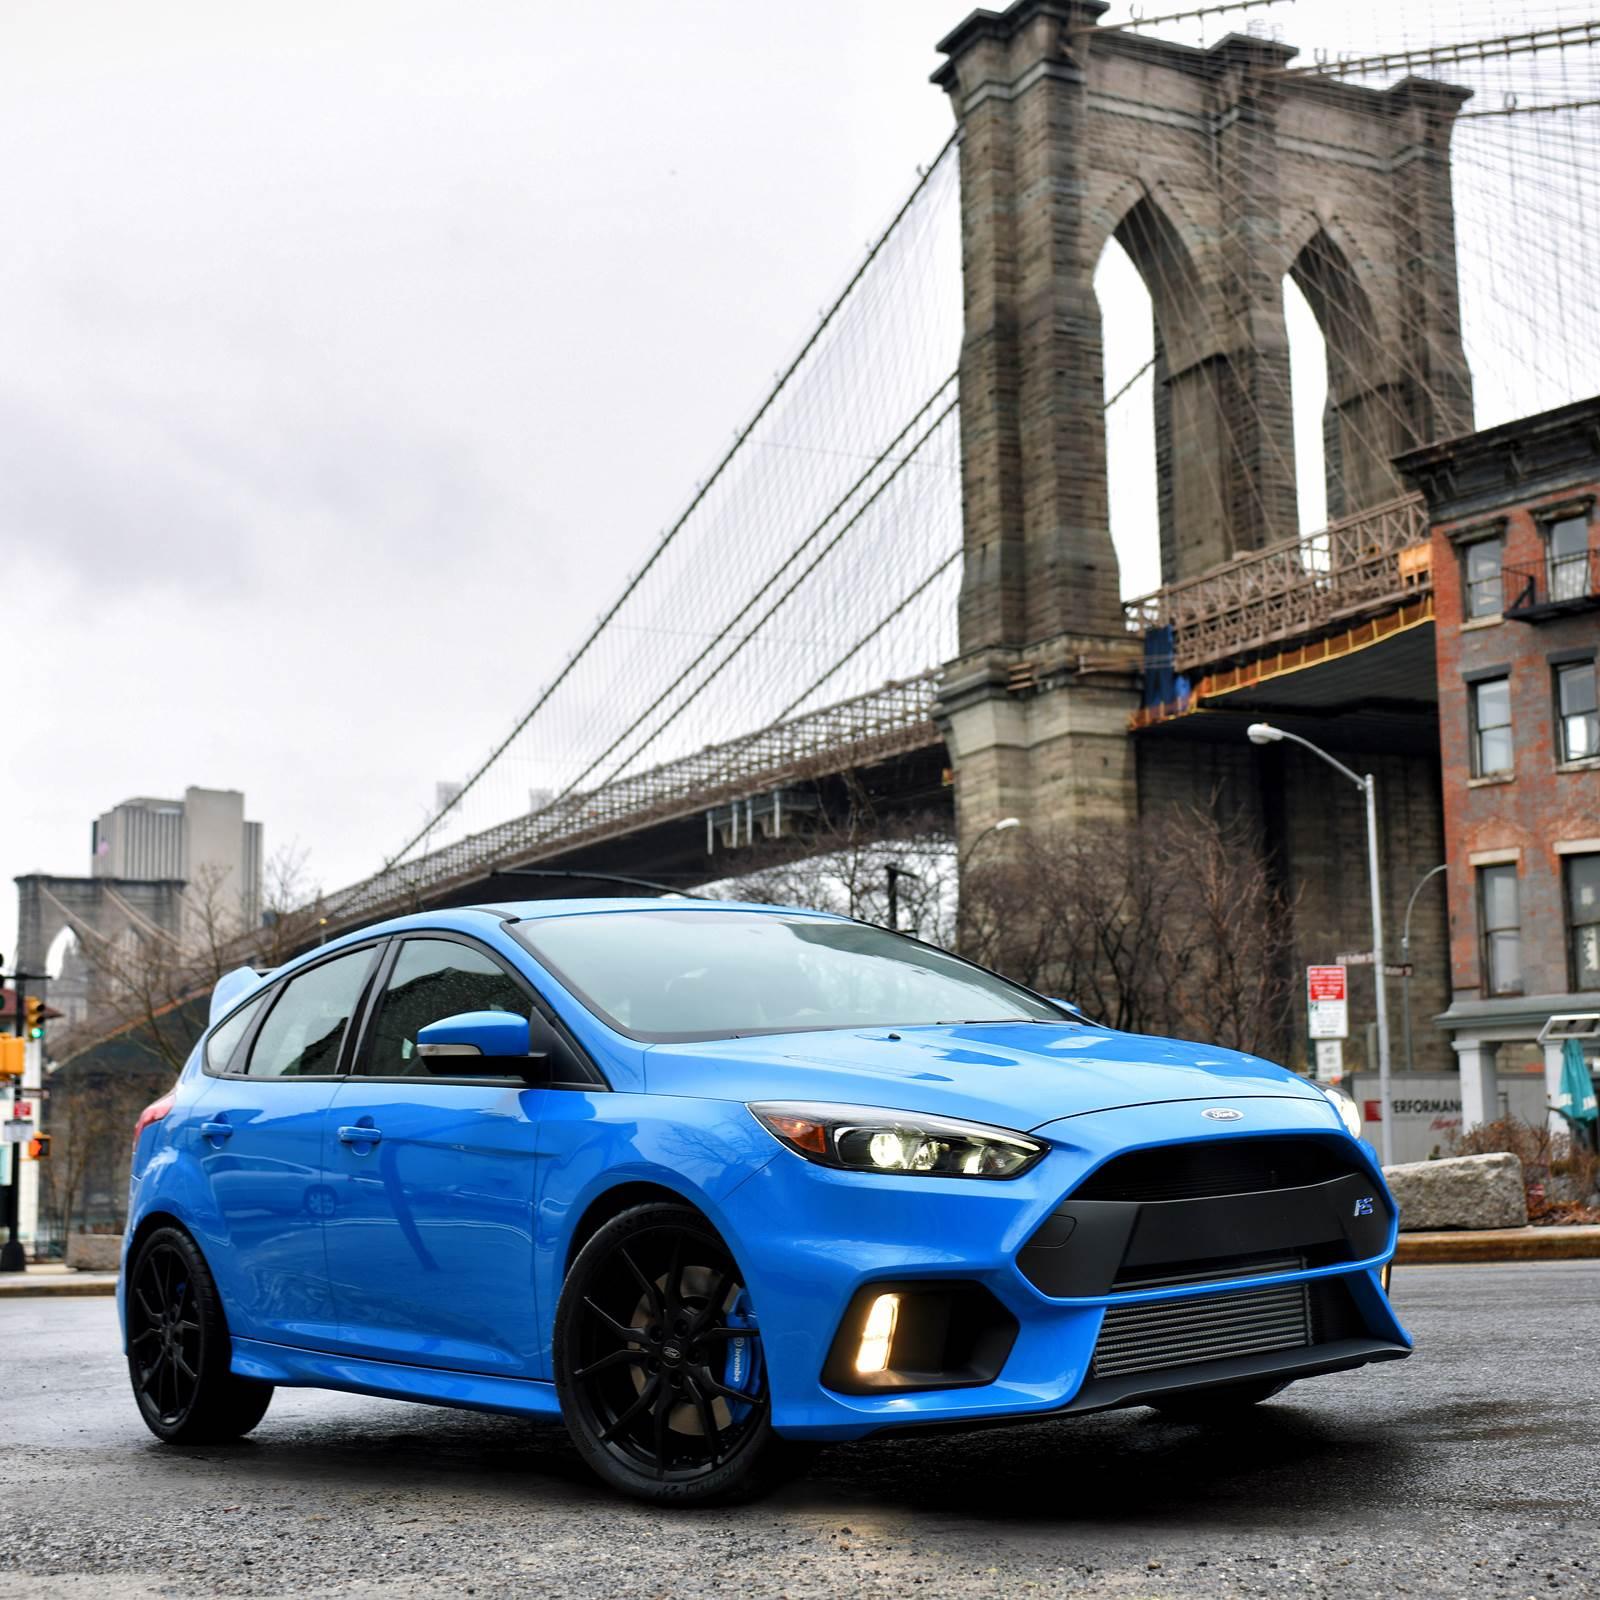 2016 Ford Focus RS US SPEC